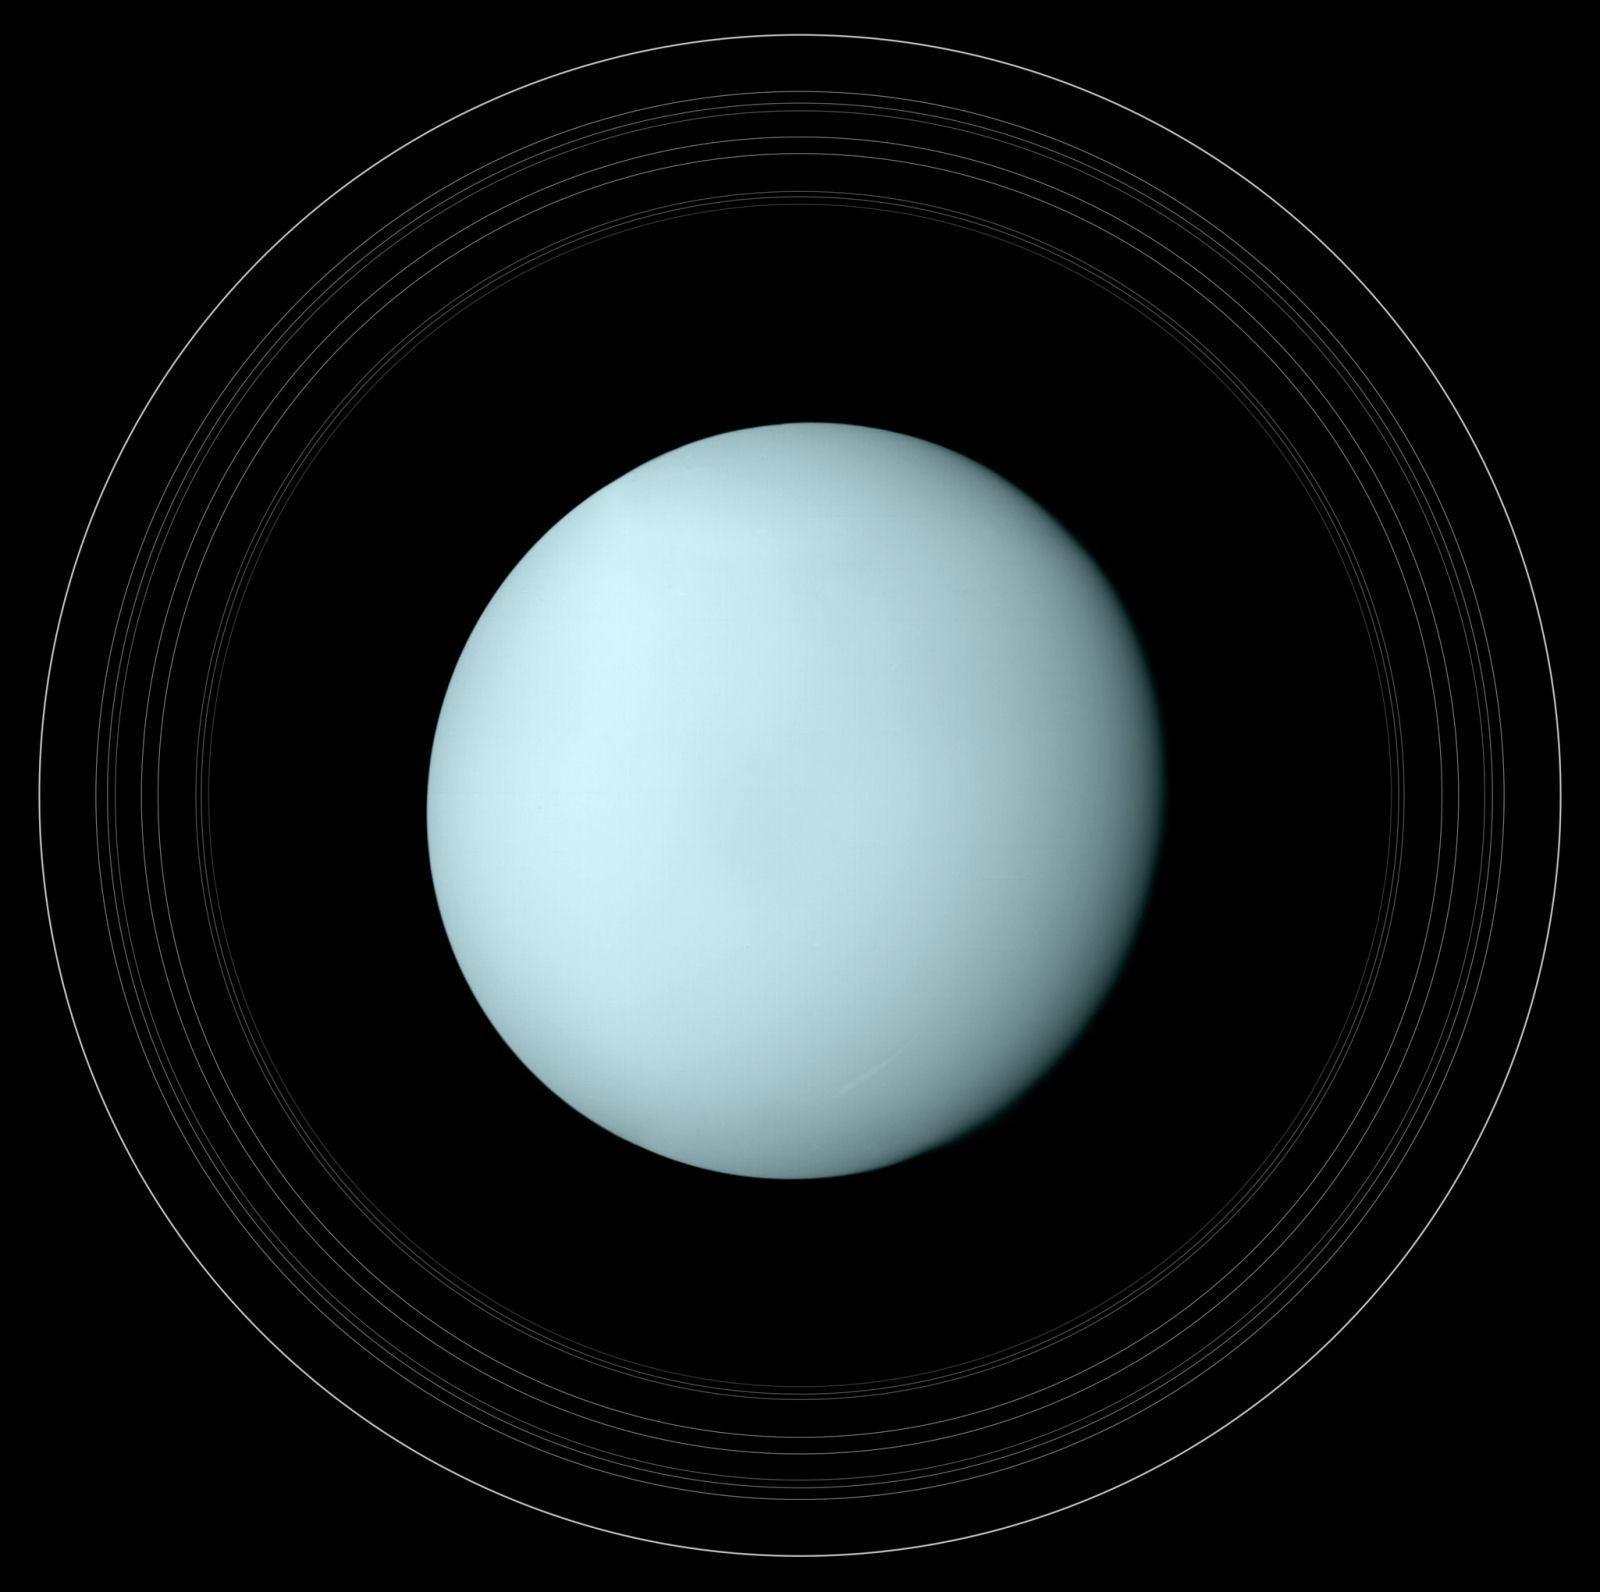 Drawn planet uranus planet Uranus High Resolution Planets Image